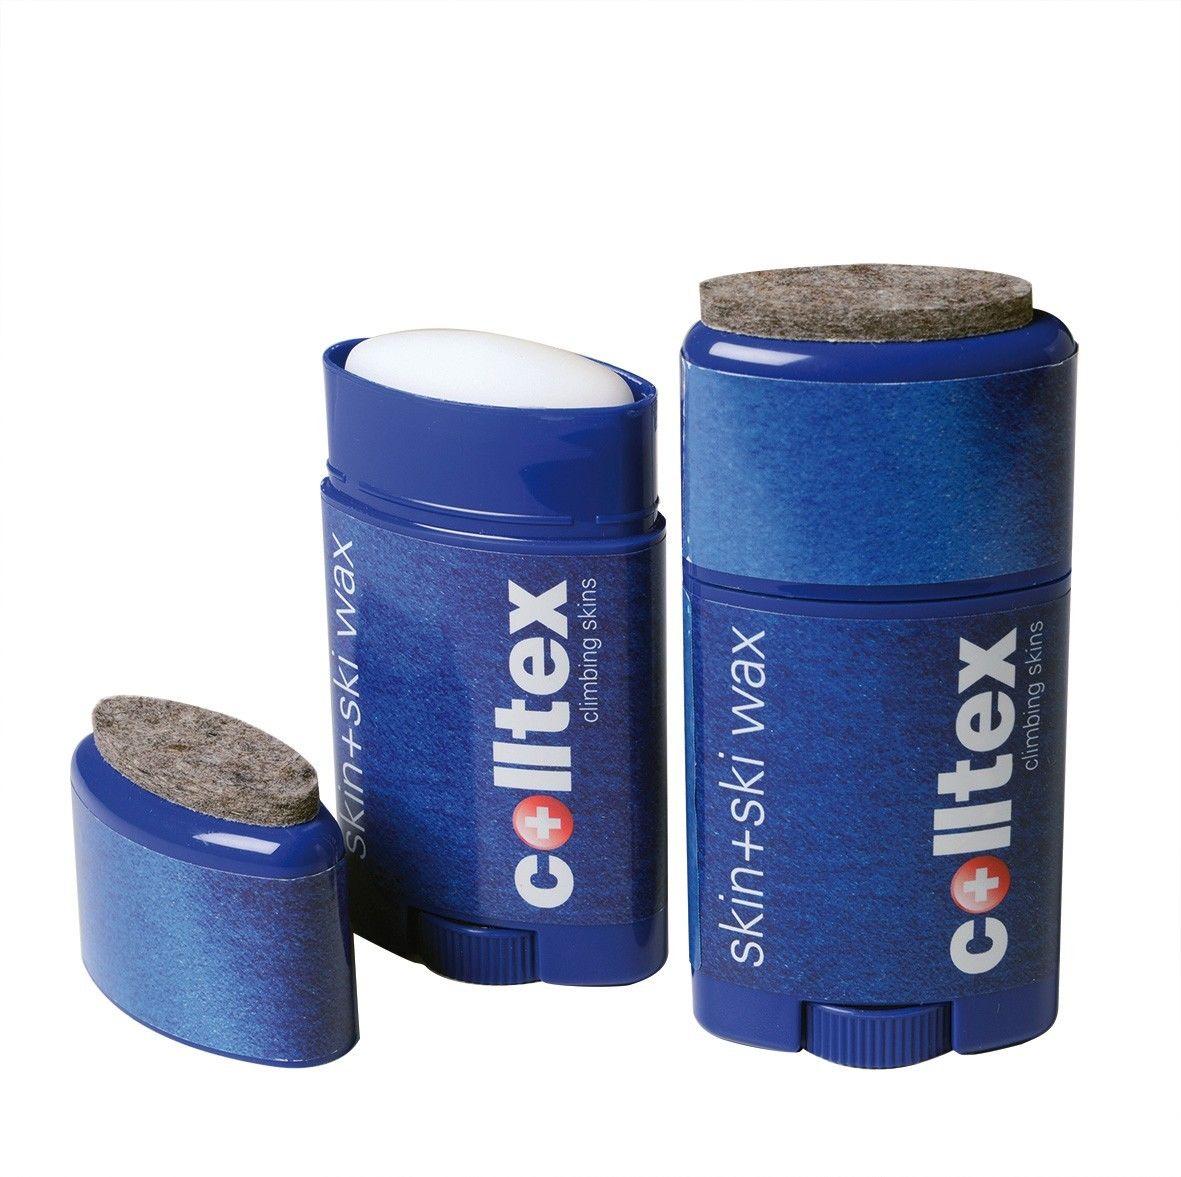 Colltex Ski UND Skin Wachs Blau, Ski & Tourenski, One Size